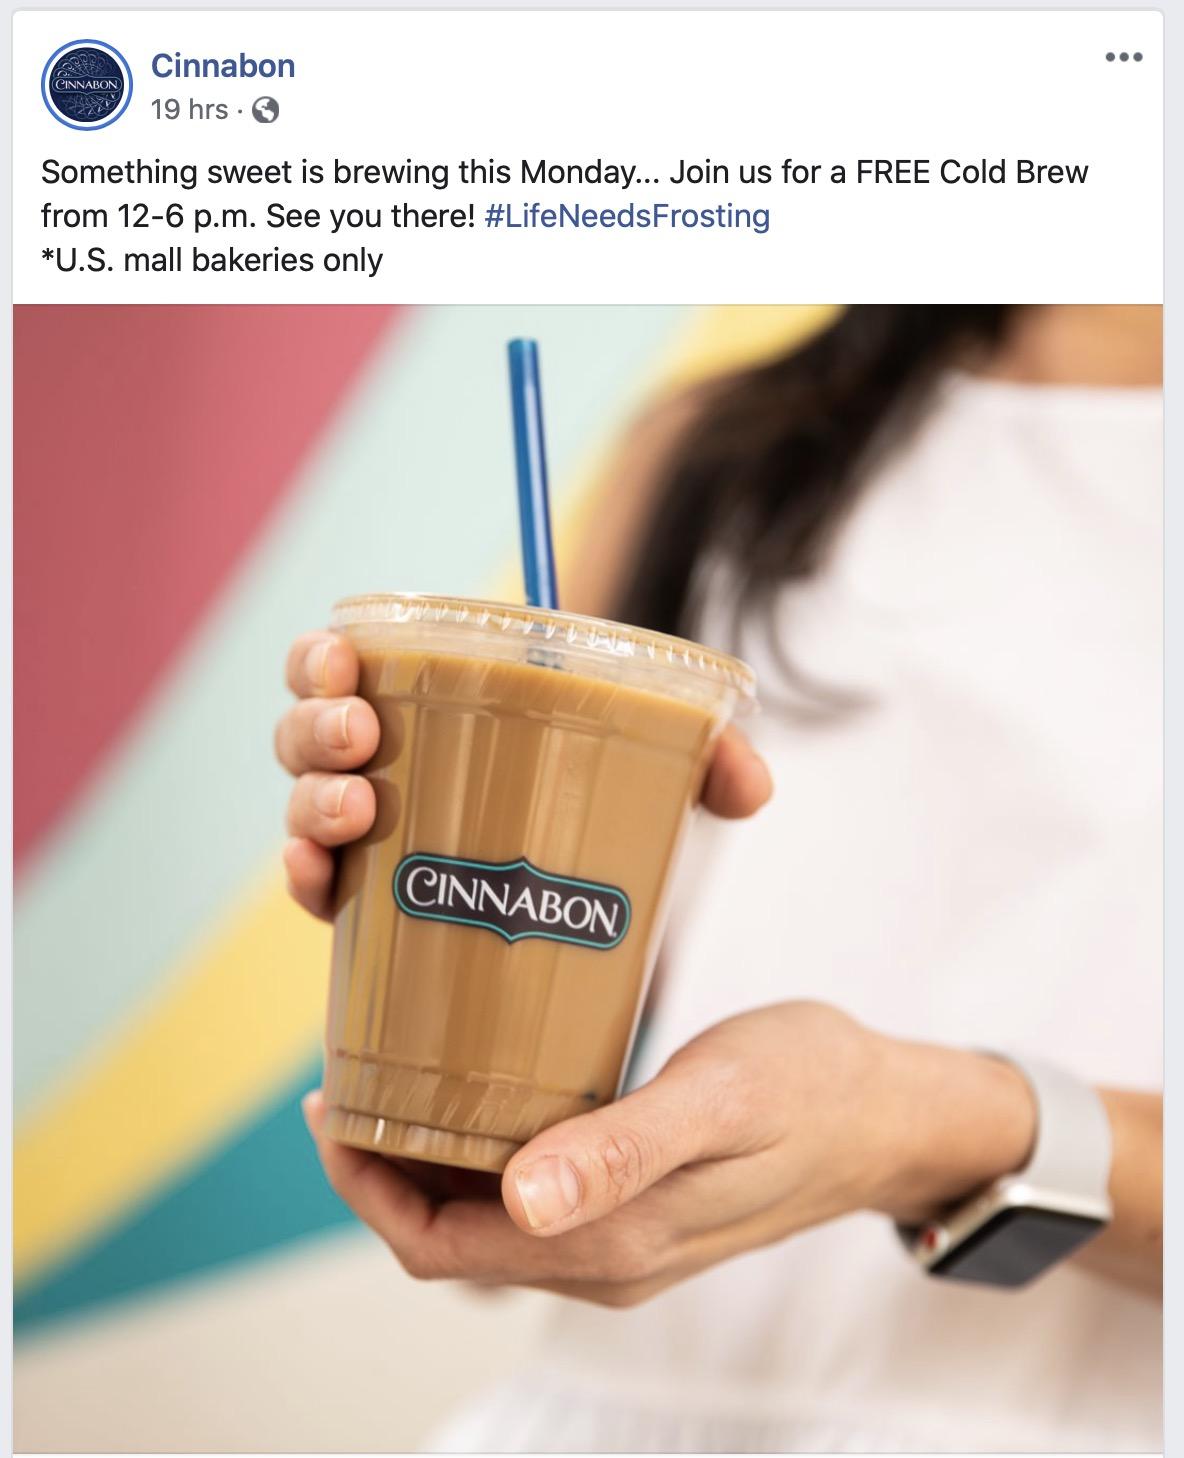 Cinnabon Coffee Coupons Free